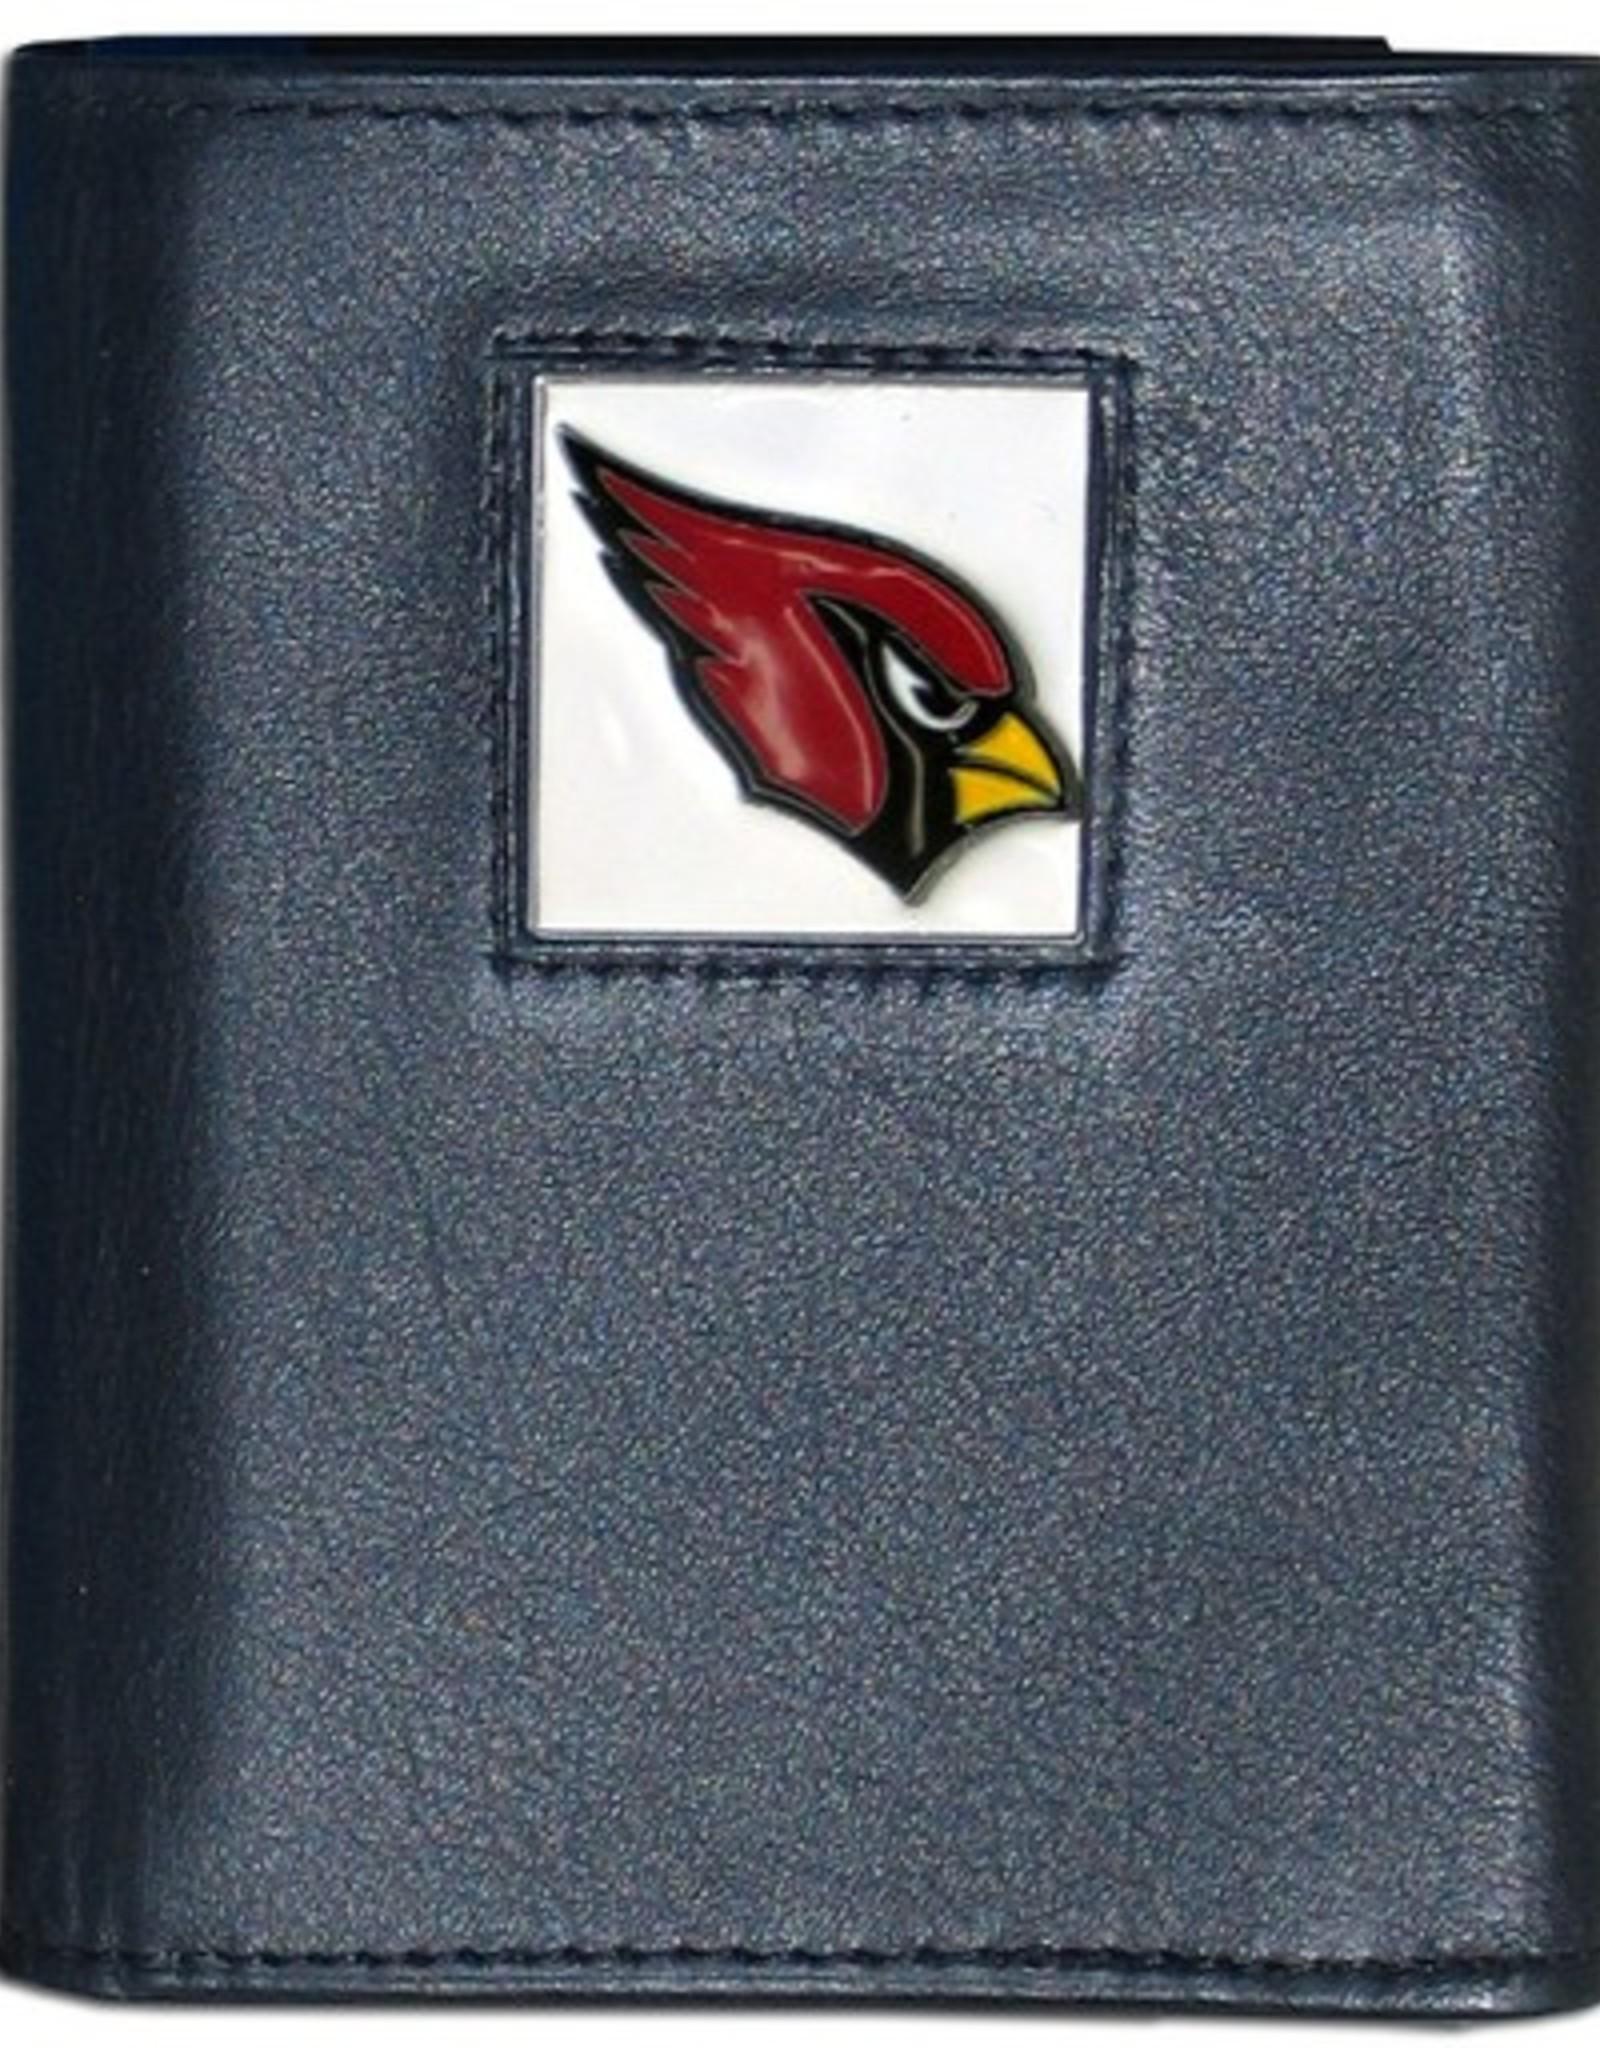 SISKIYOU GIFTS Arizona Cardinals Executive Black Leather Trifold Wallet